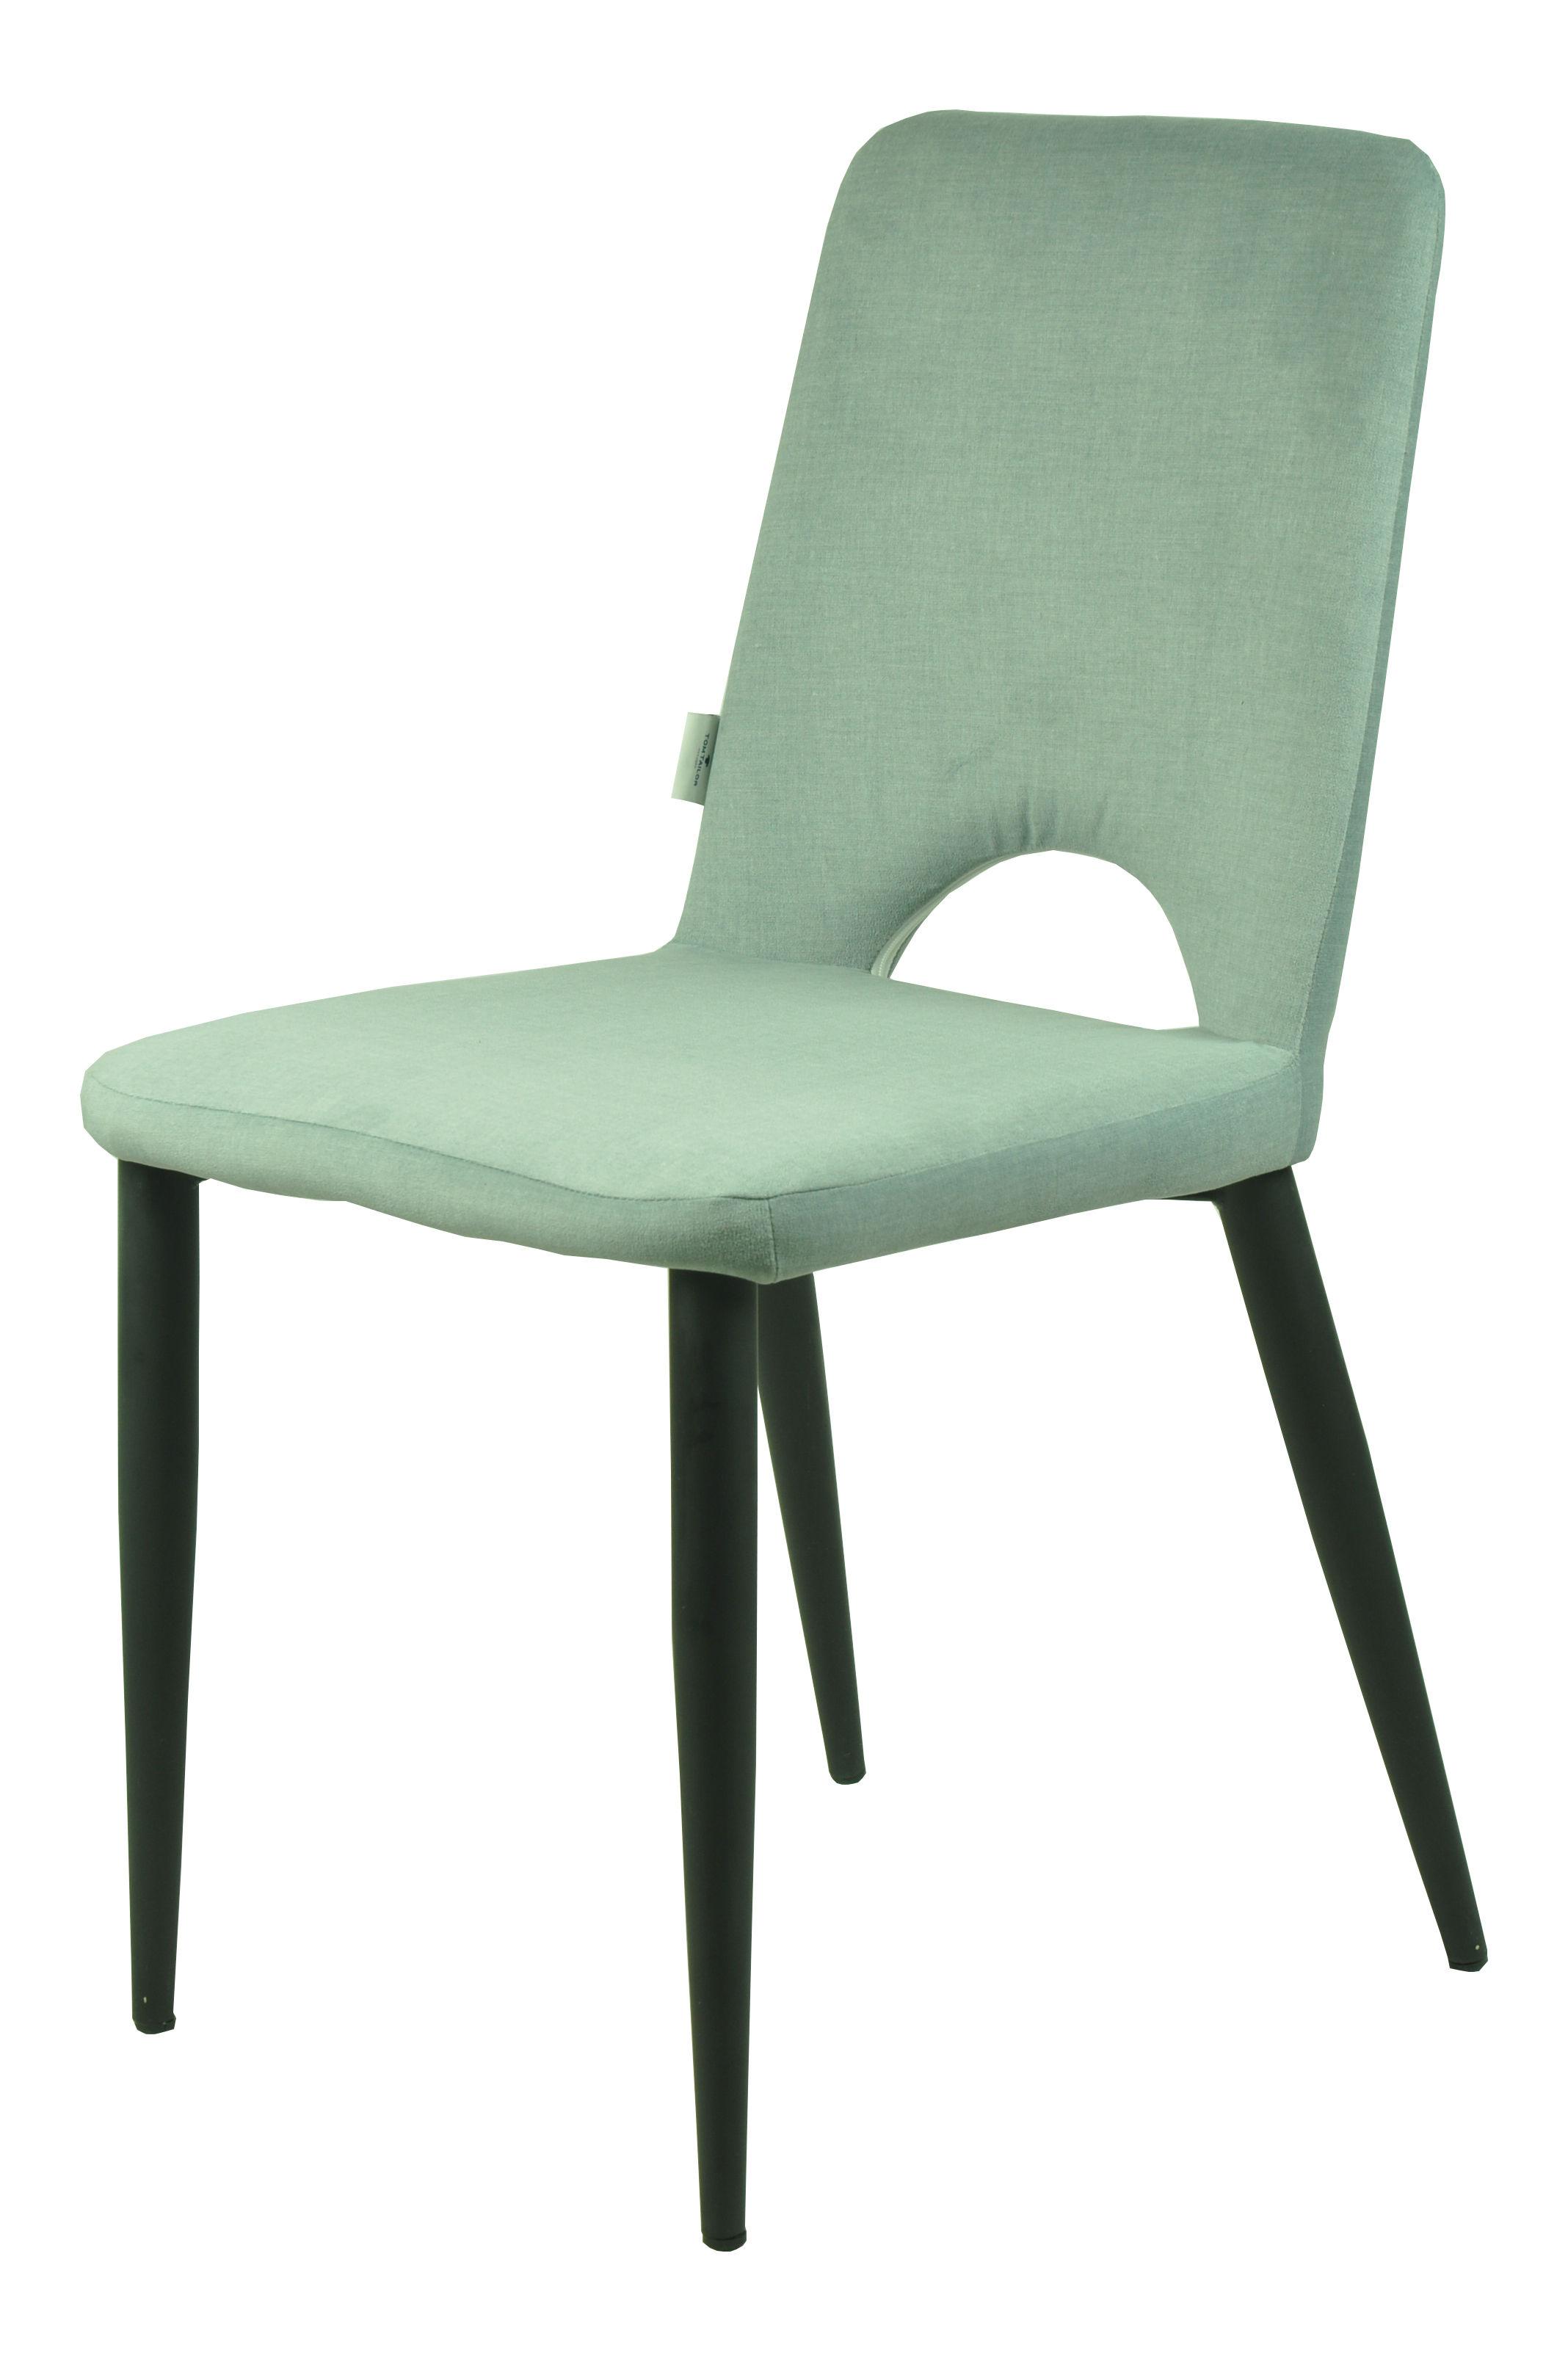 Stuhl tom schwarz cheap stuhl erset bezug aus stoff von - Stuhl tom grau ...